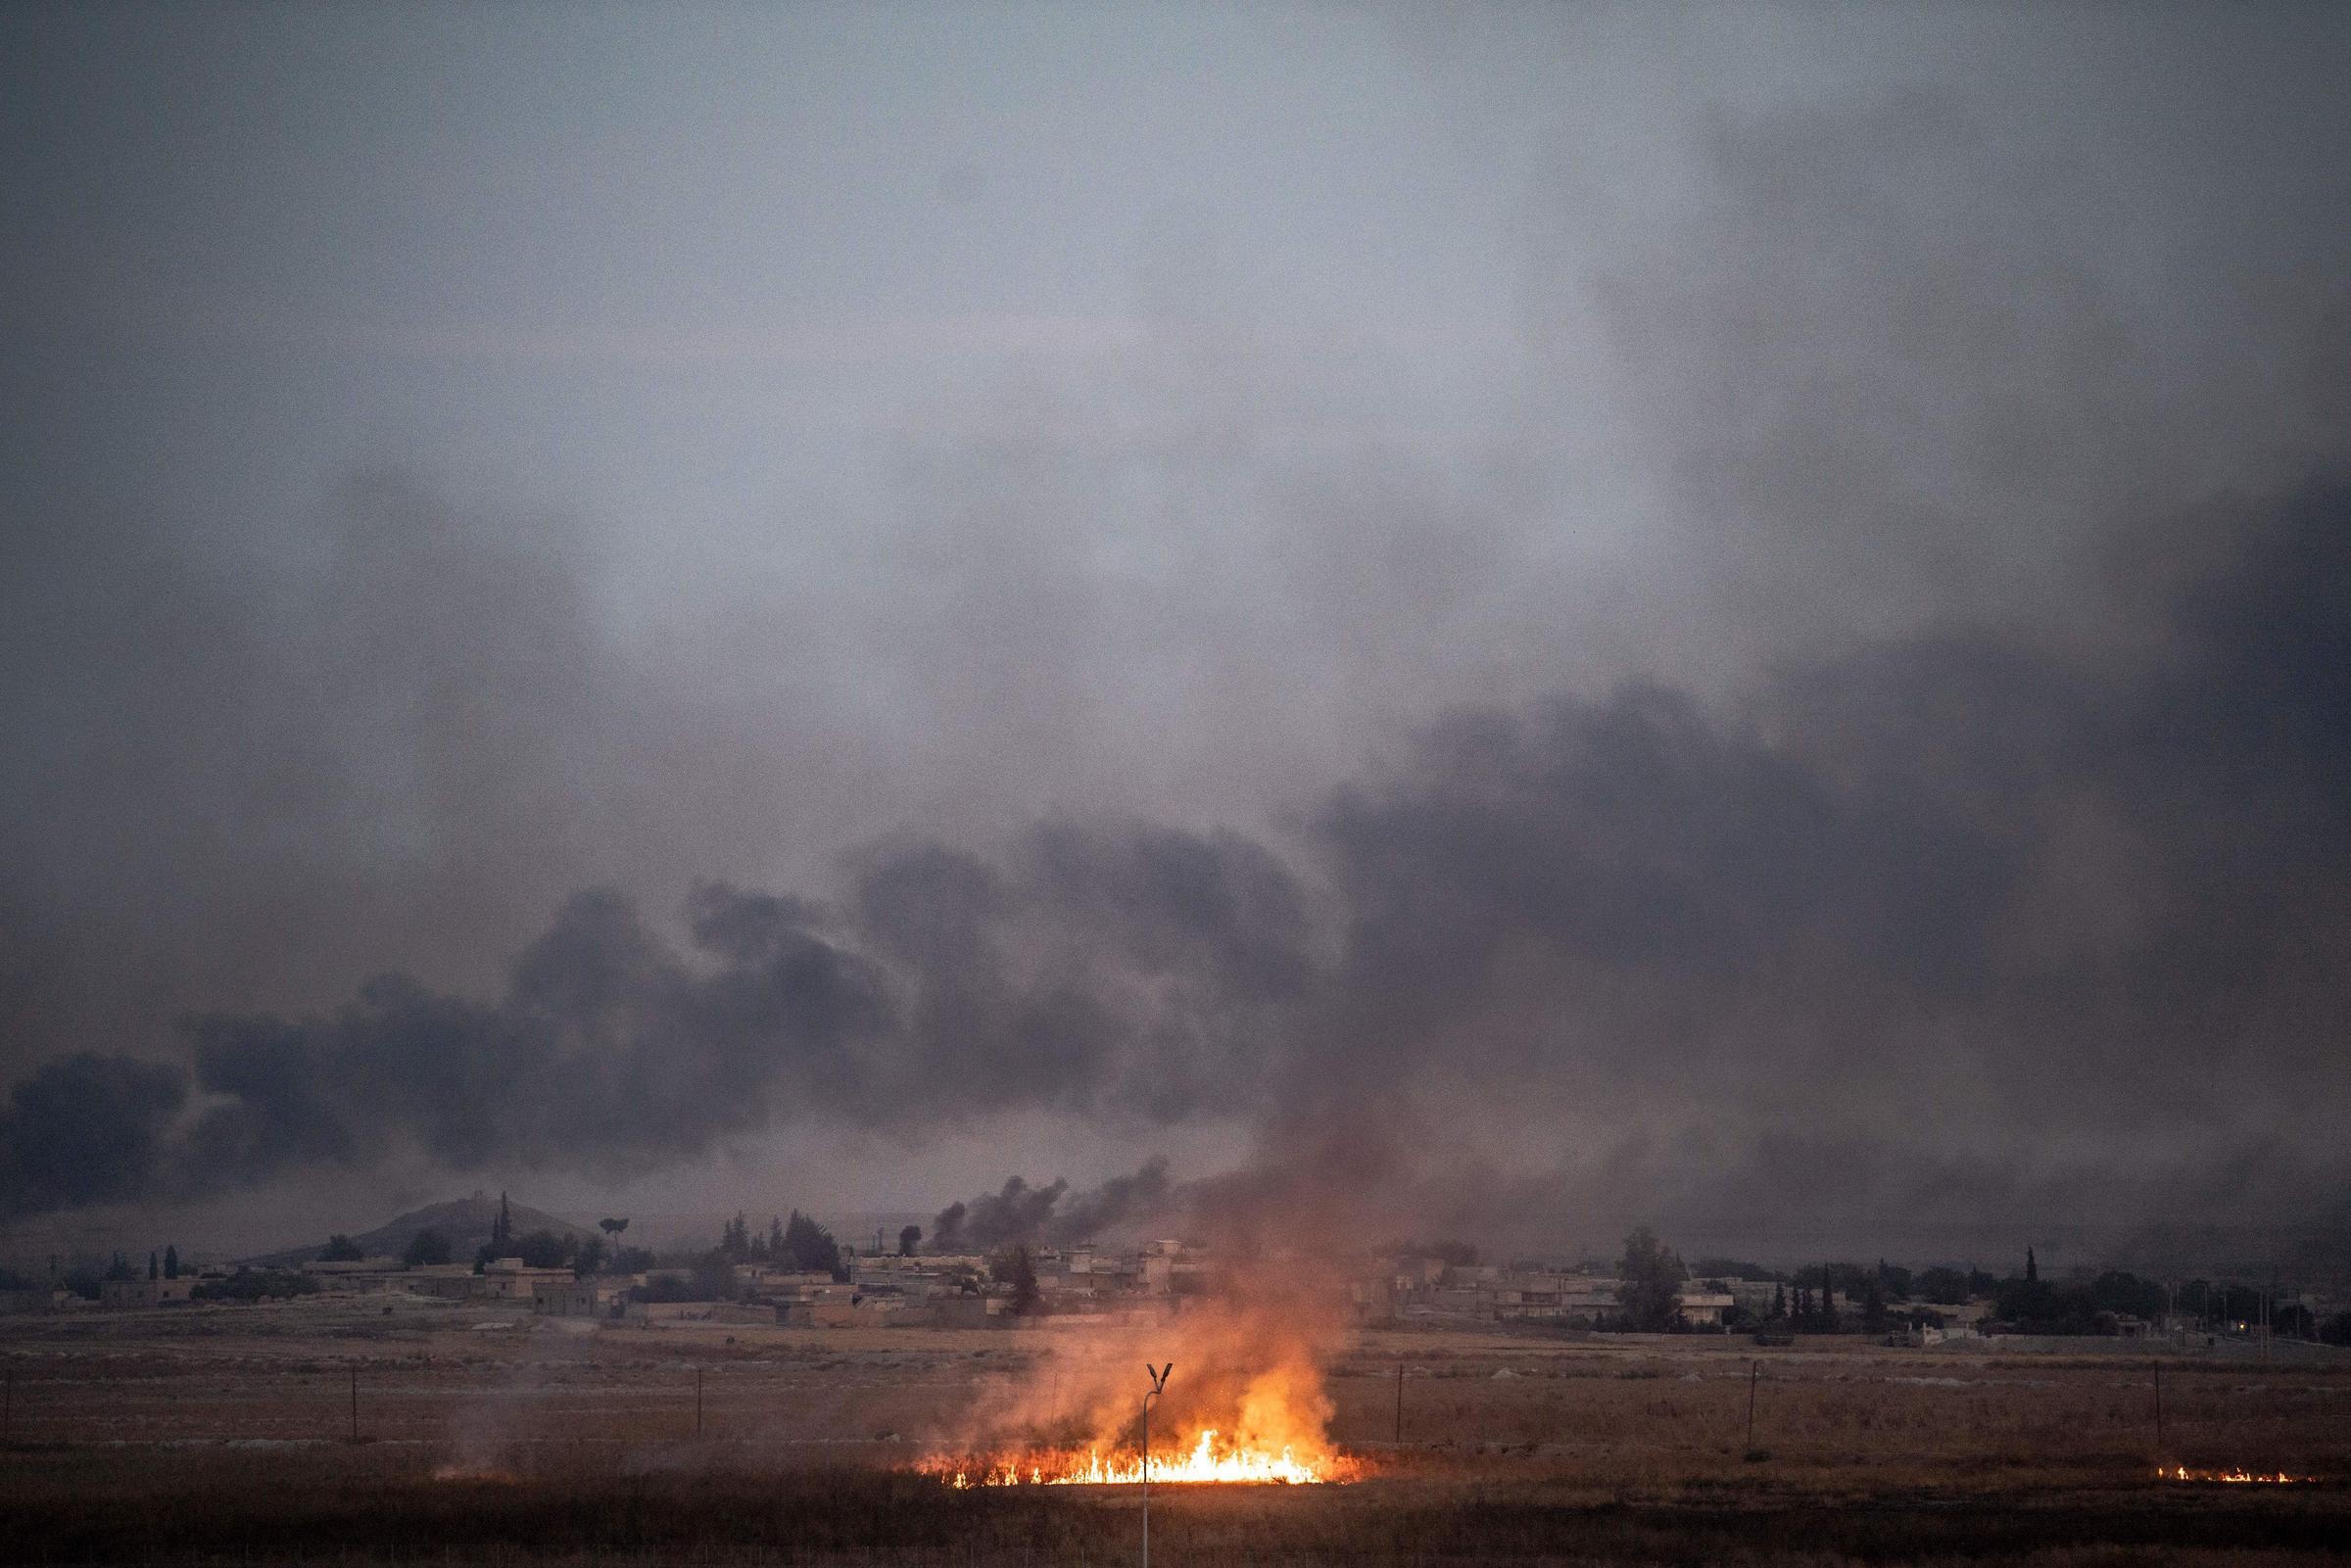 Turkey's Invasion of Syria Worsens A Humanitarian Crisis